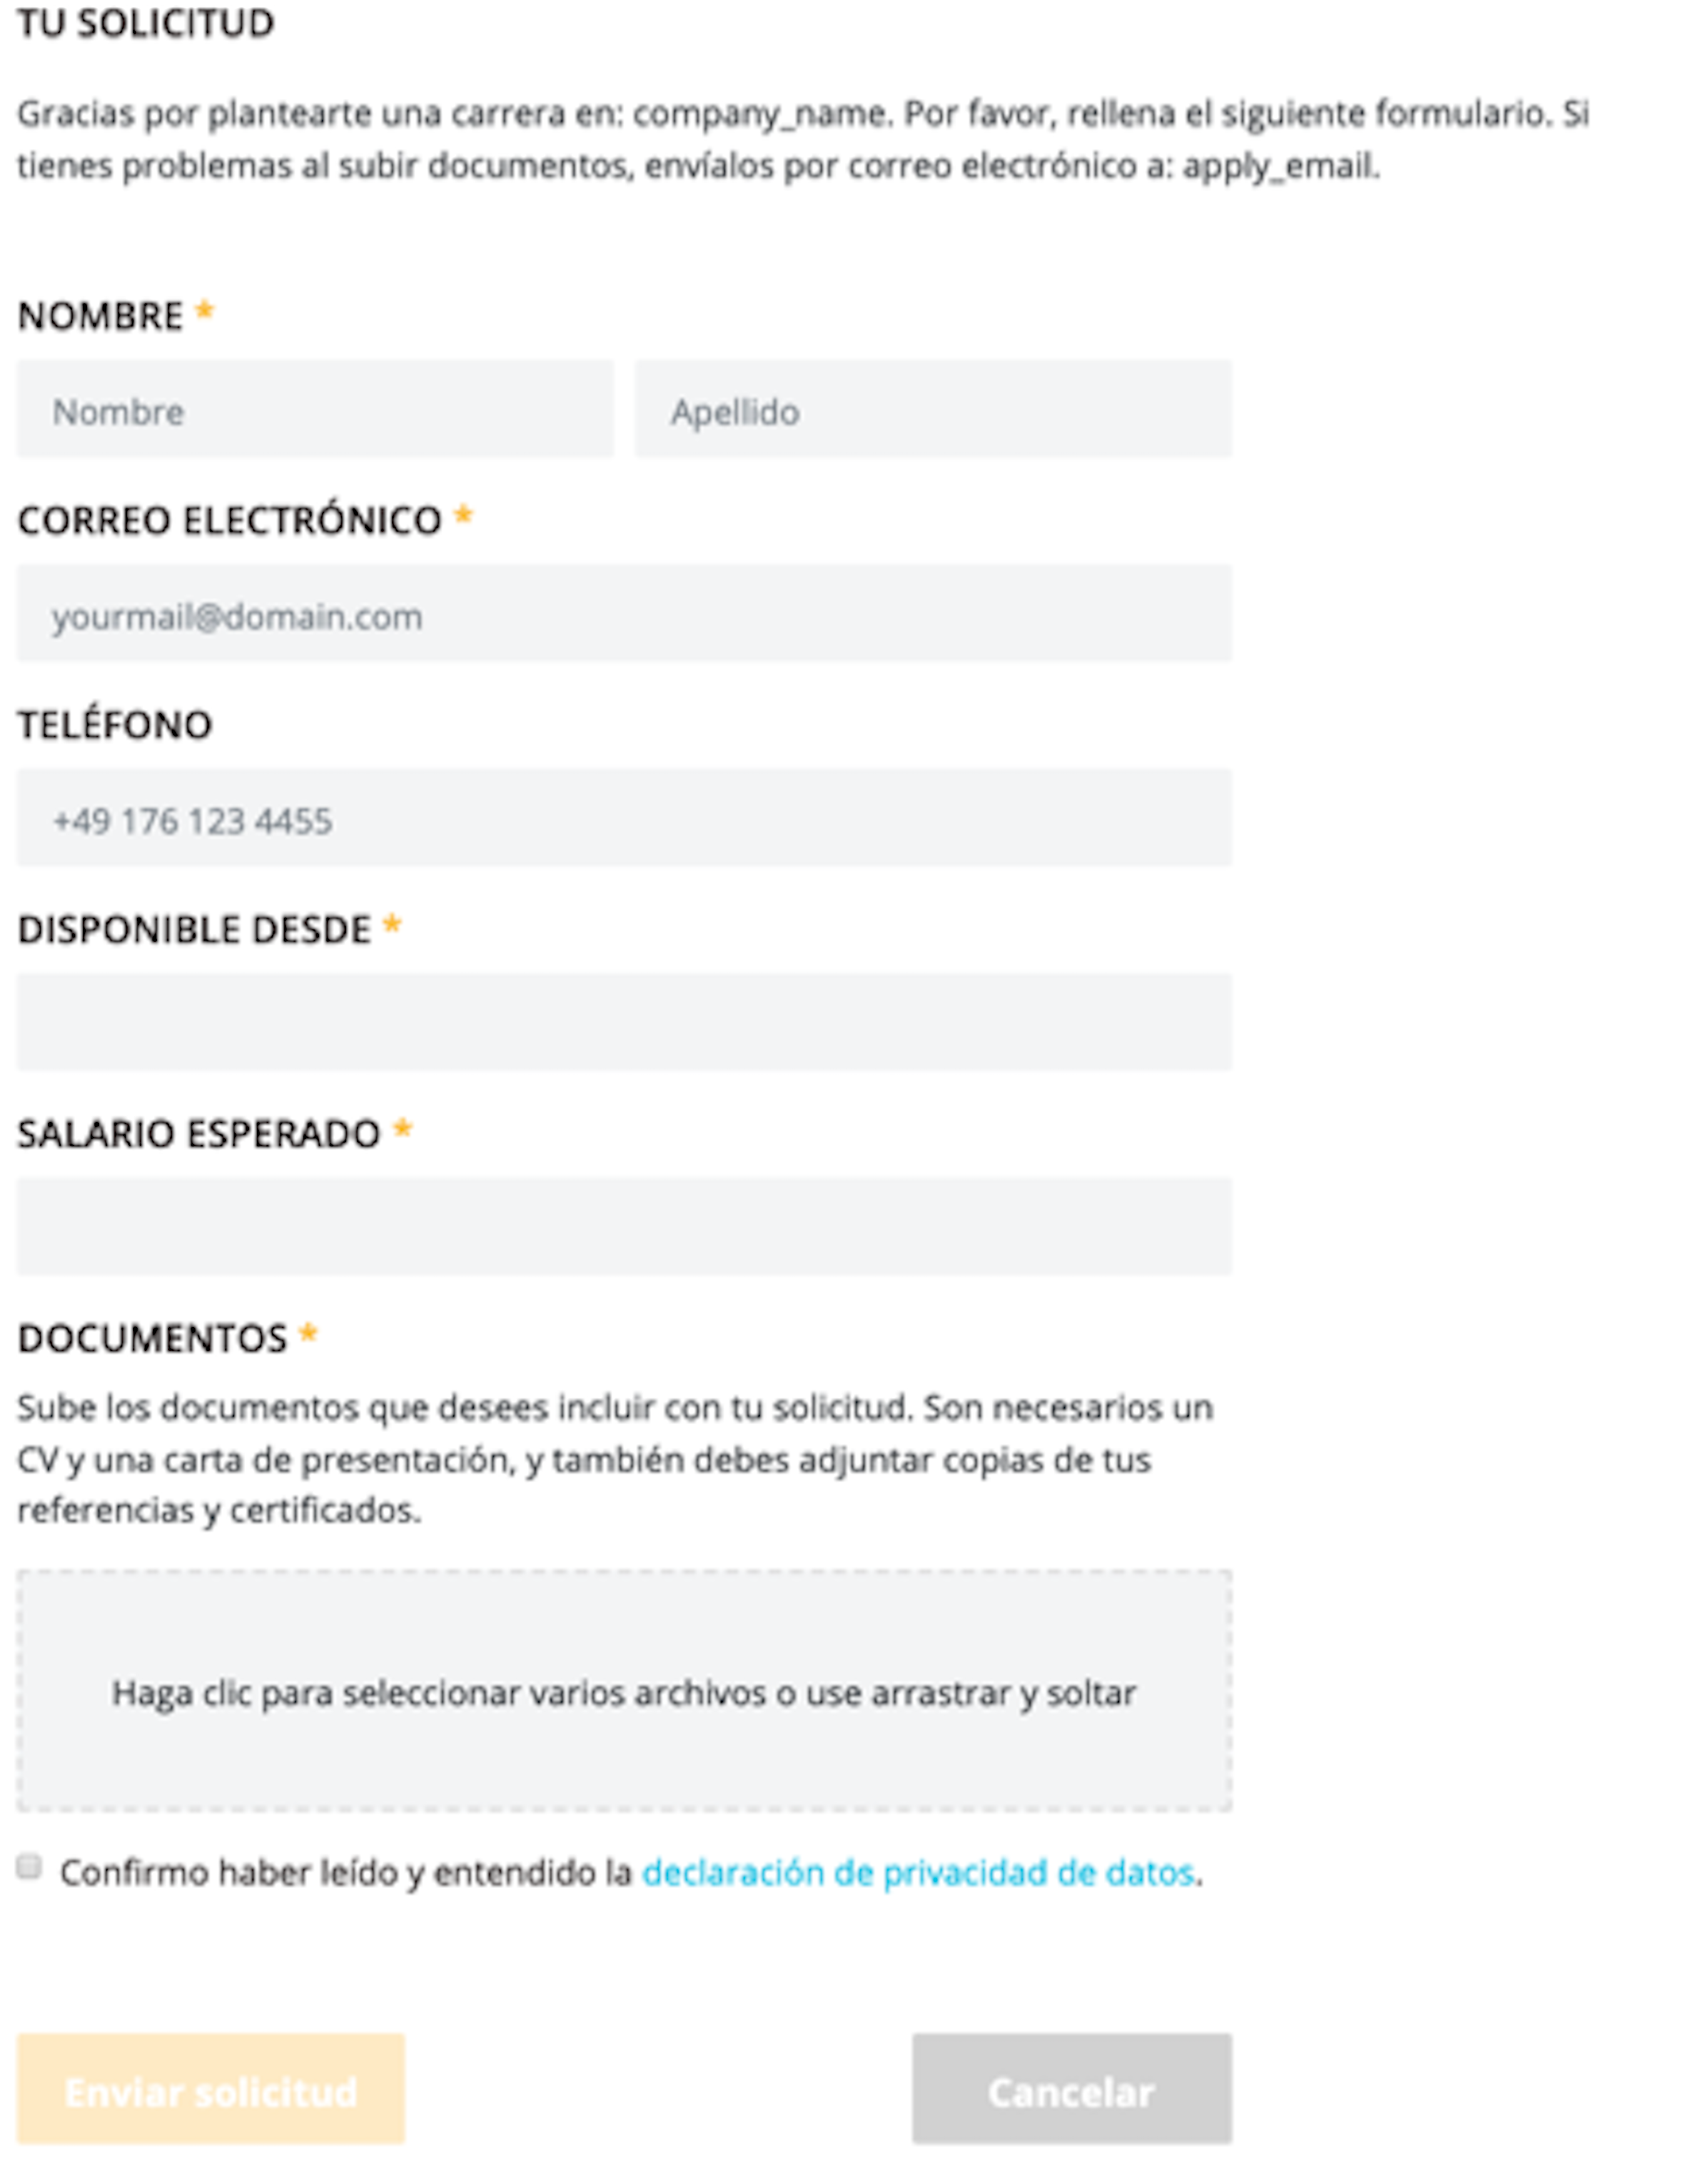 Careerpage-Applicationform2_es.png